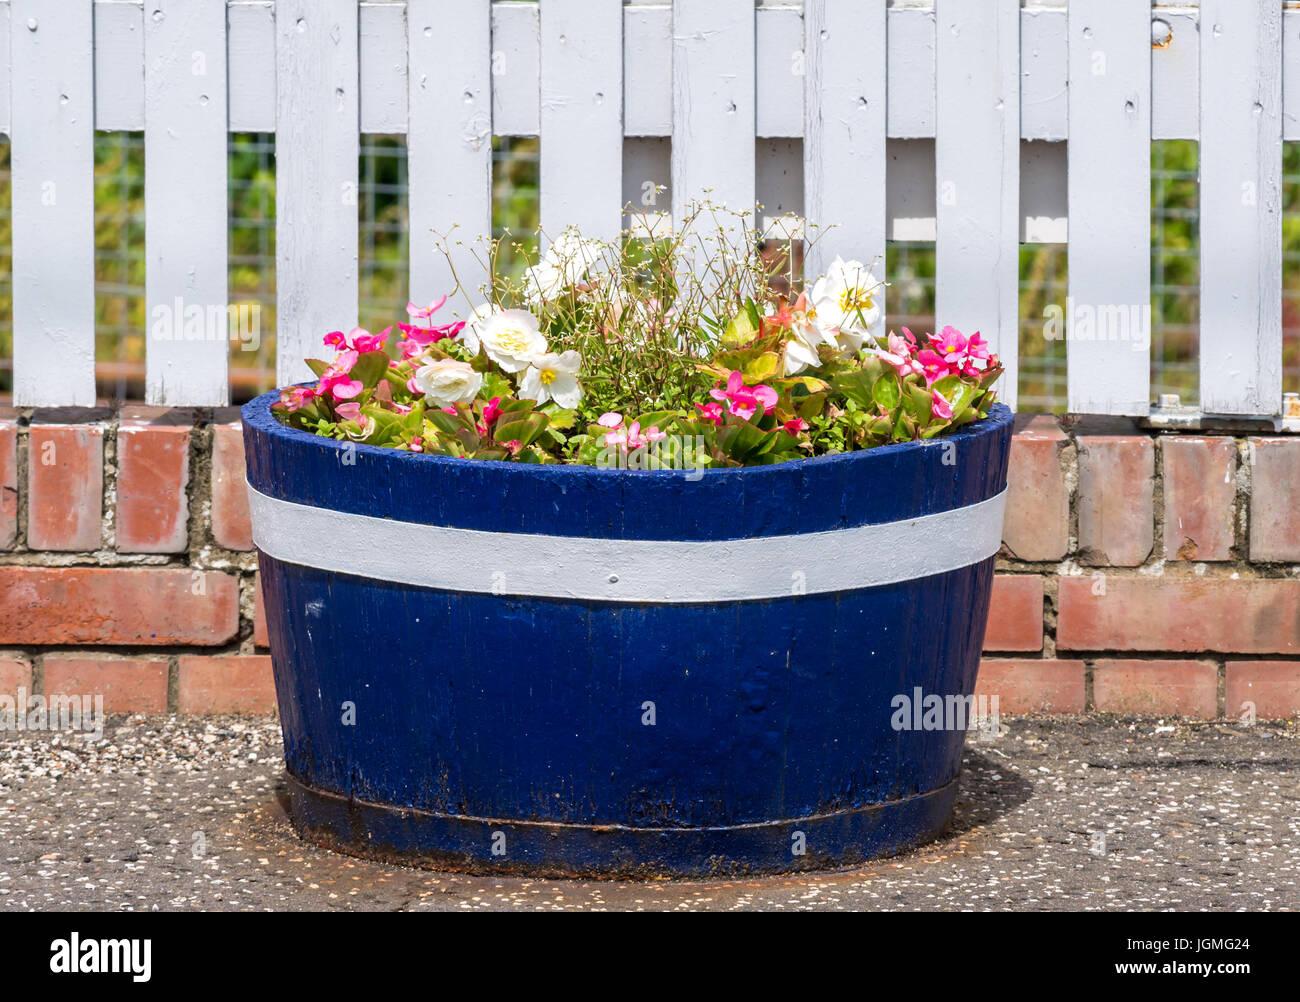 Close up of flower barrel, Drem train station platform filled with summer flowers next to white picket fence, East - Stock Image